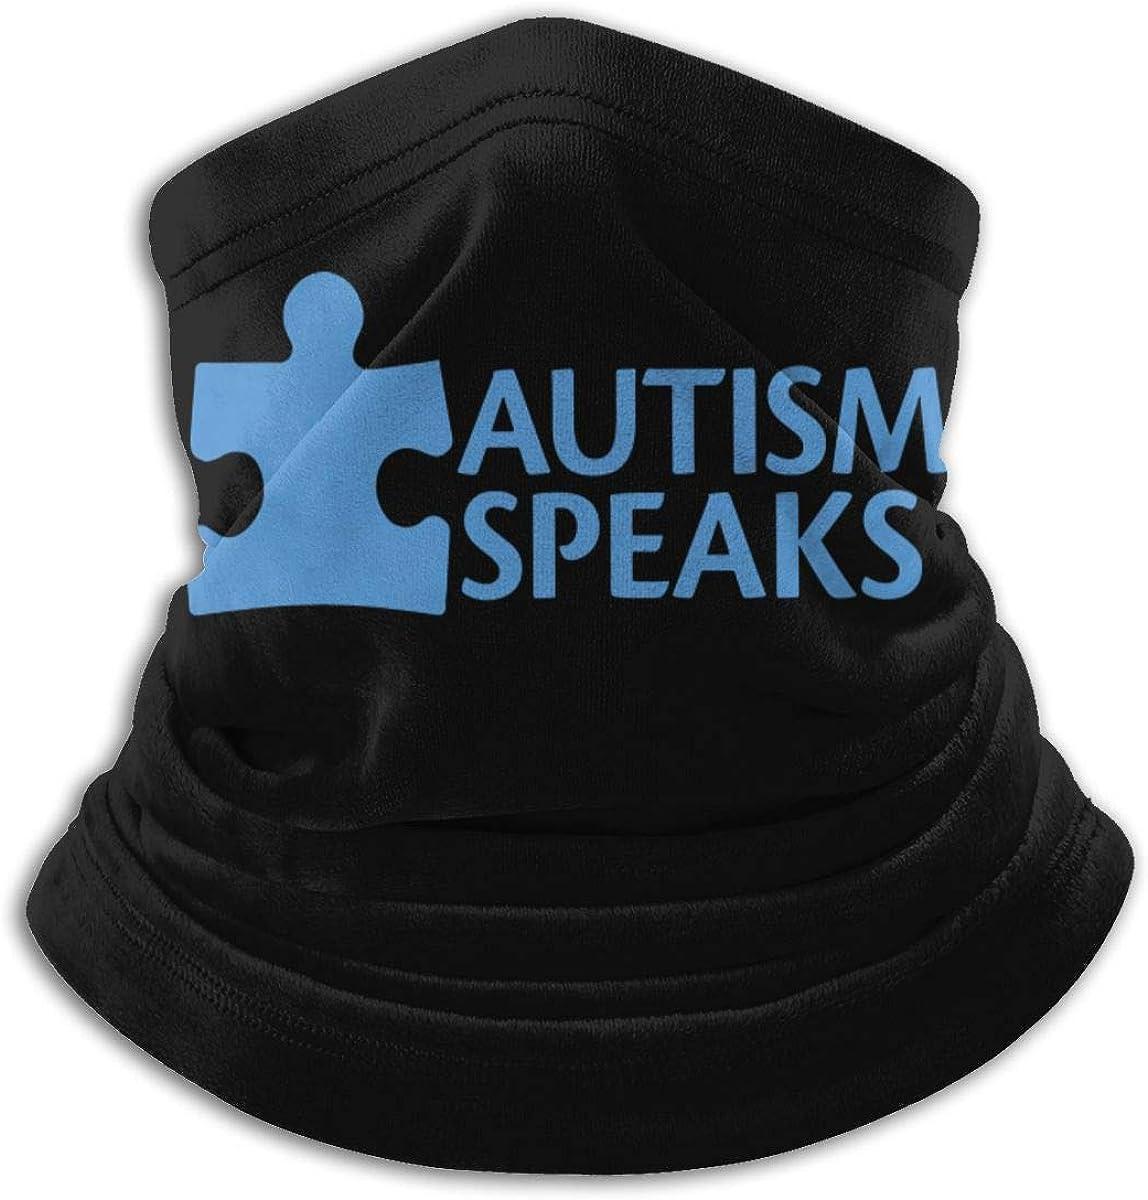 Autism Speaks Black Multi-function Neck Warmer Gaiter Polyester Neck Warmer Windproof Winter Neck Gaiter Cold Weather Scarf For Men Women